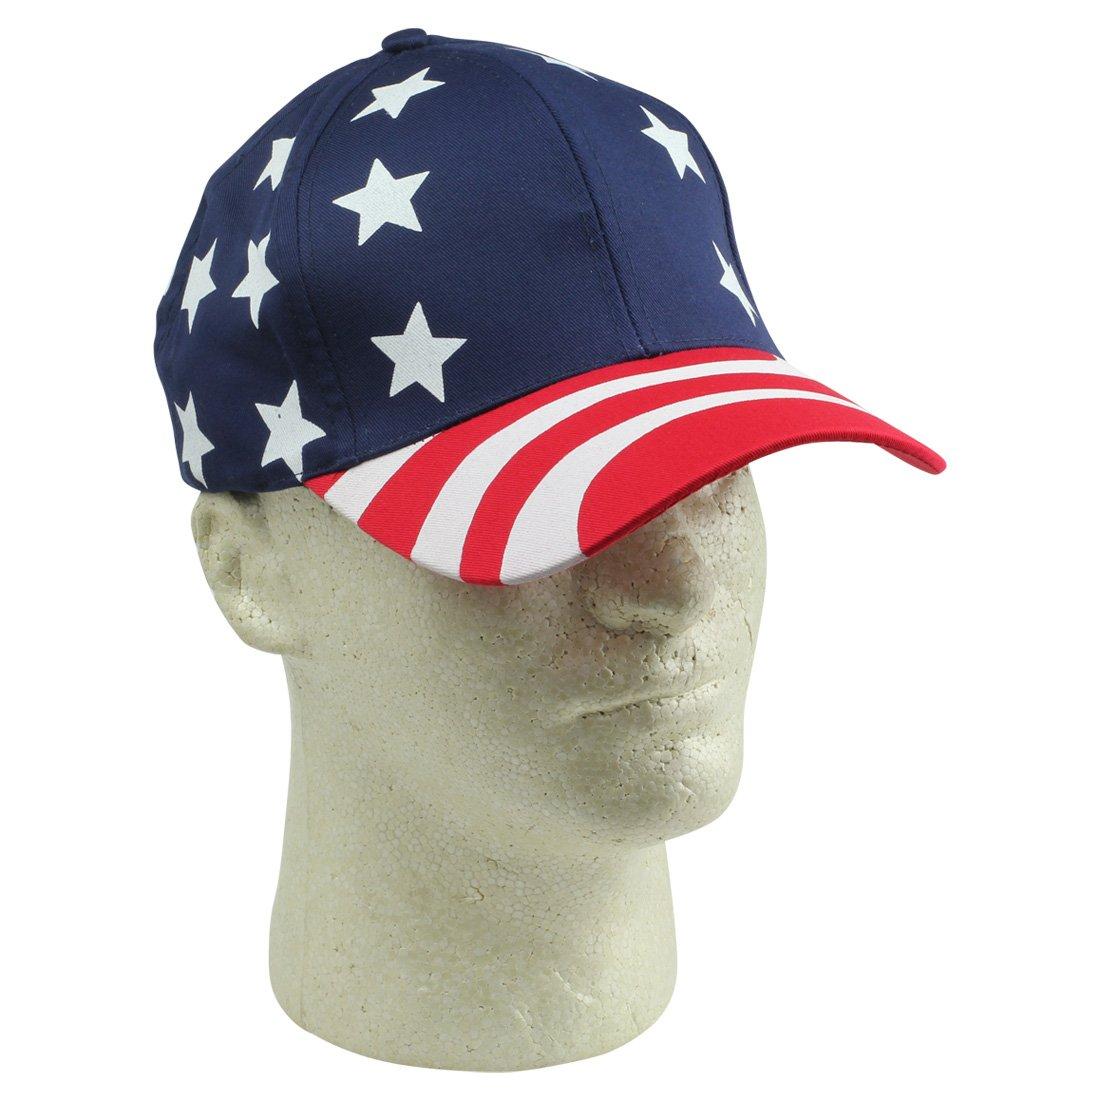 173a56e3f967 Amazon.com  DALIX Hat Pro-Style USA Stars and Stripes Cap American  Patriotic Caps  Clothing